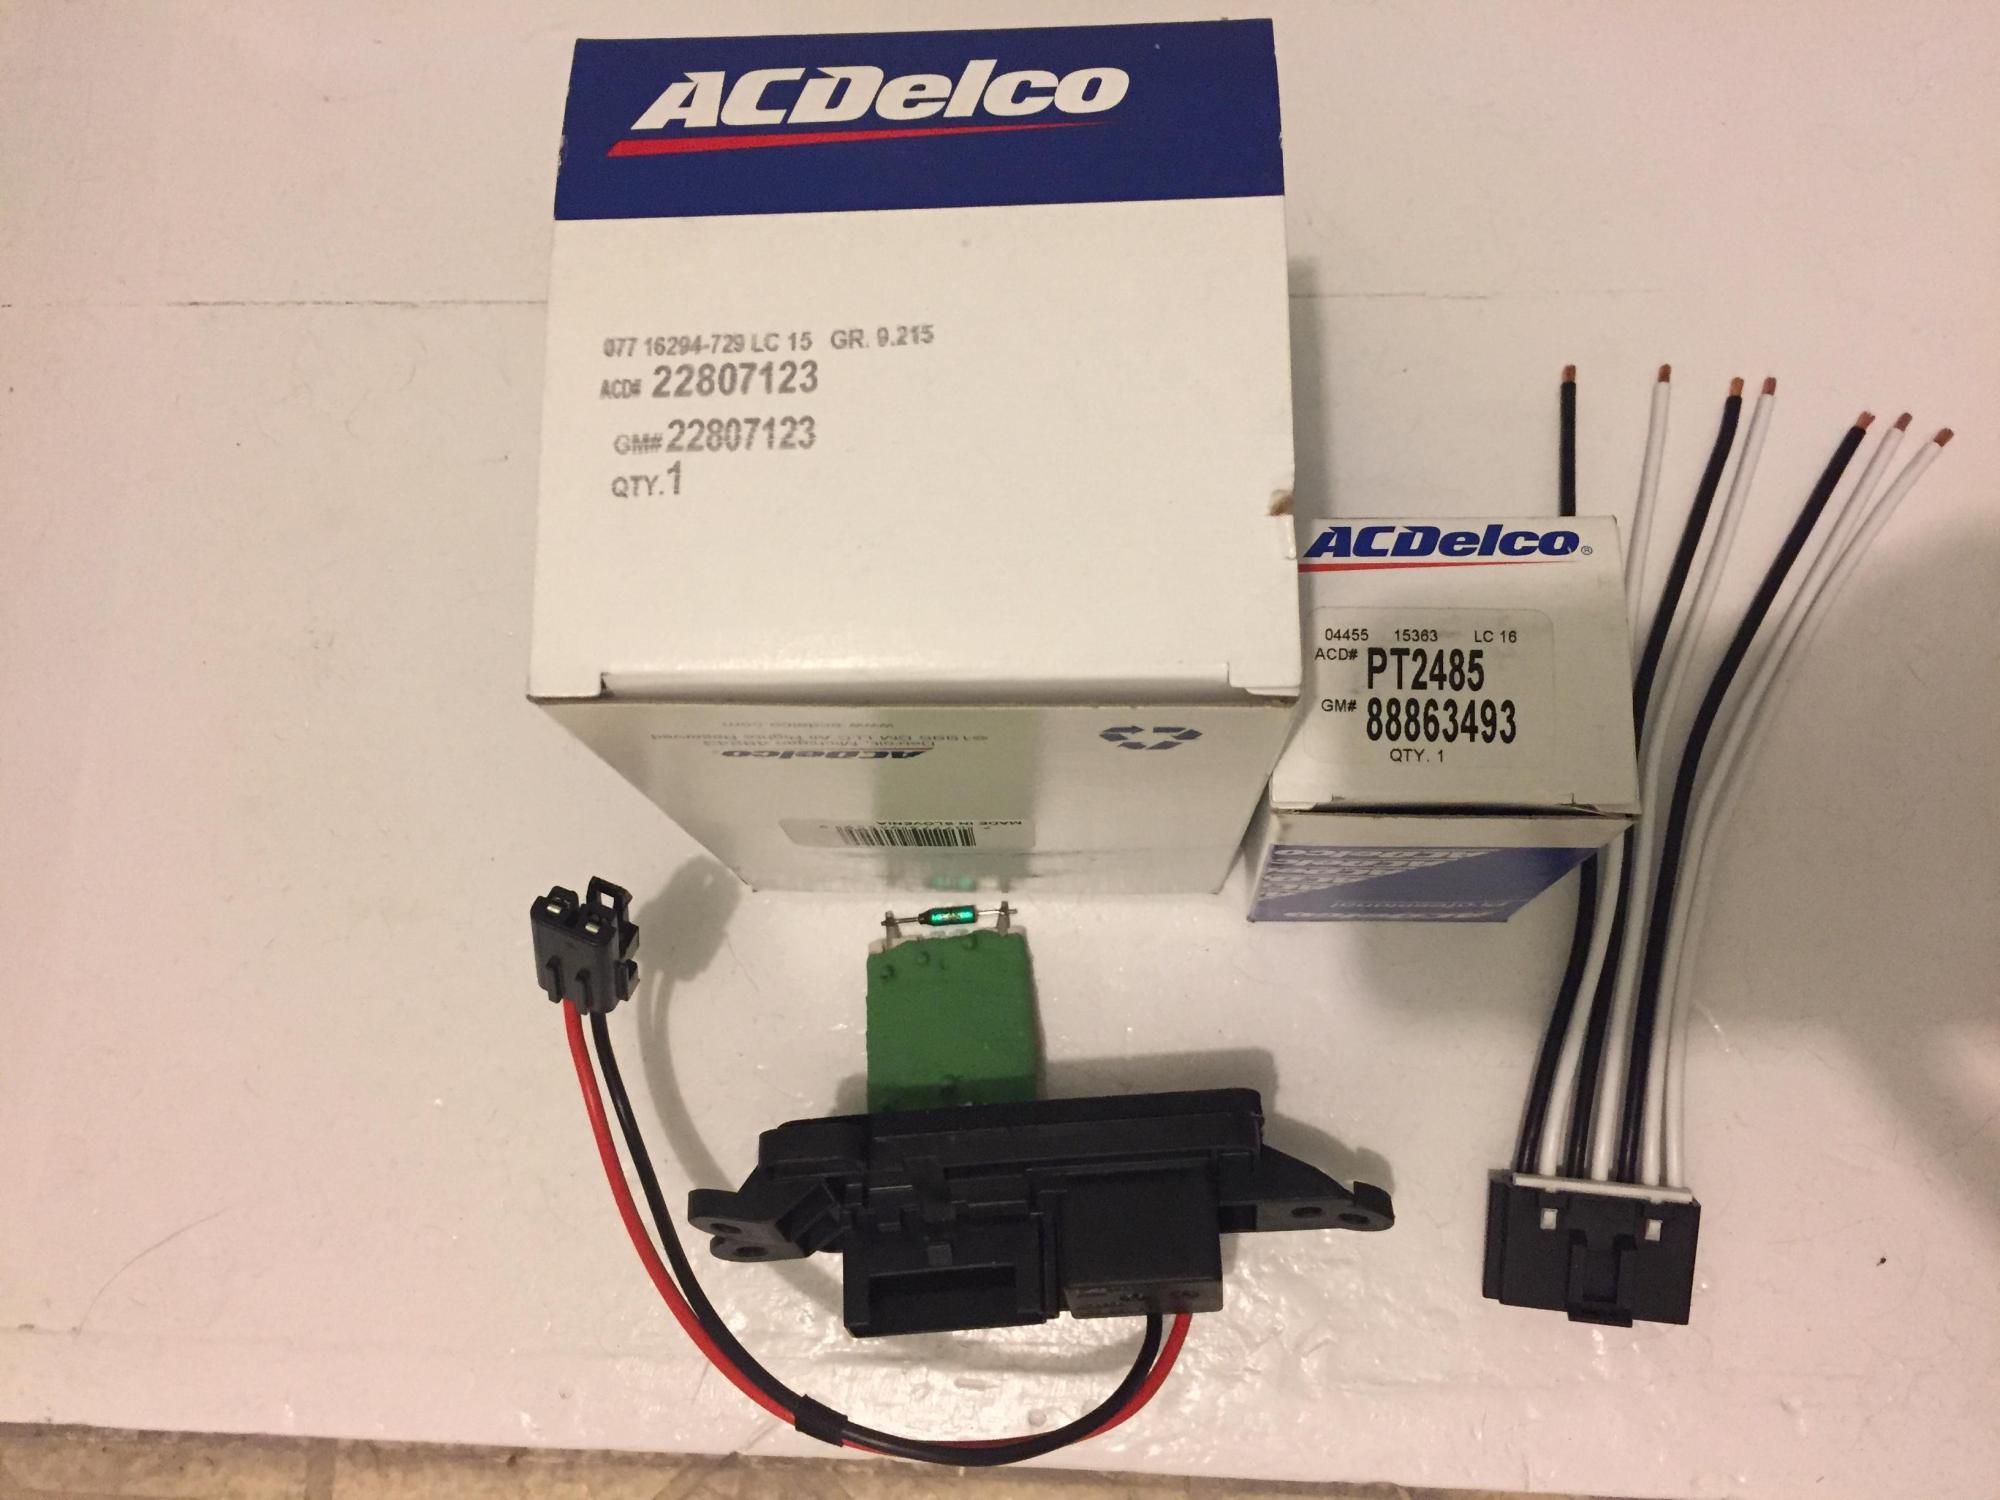 hight resolution of chevy blower motor wiring wiring diagram chevy colorado blower motor wiring harness 2006 chevrolet silverado 2500